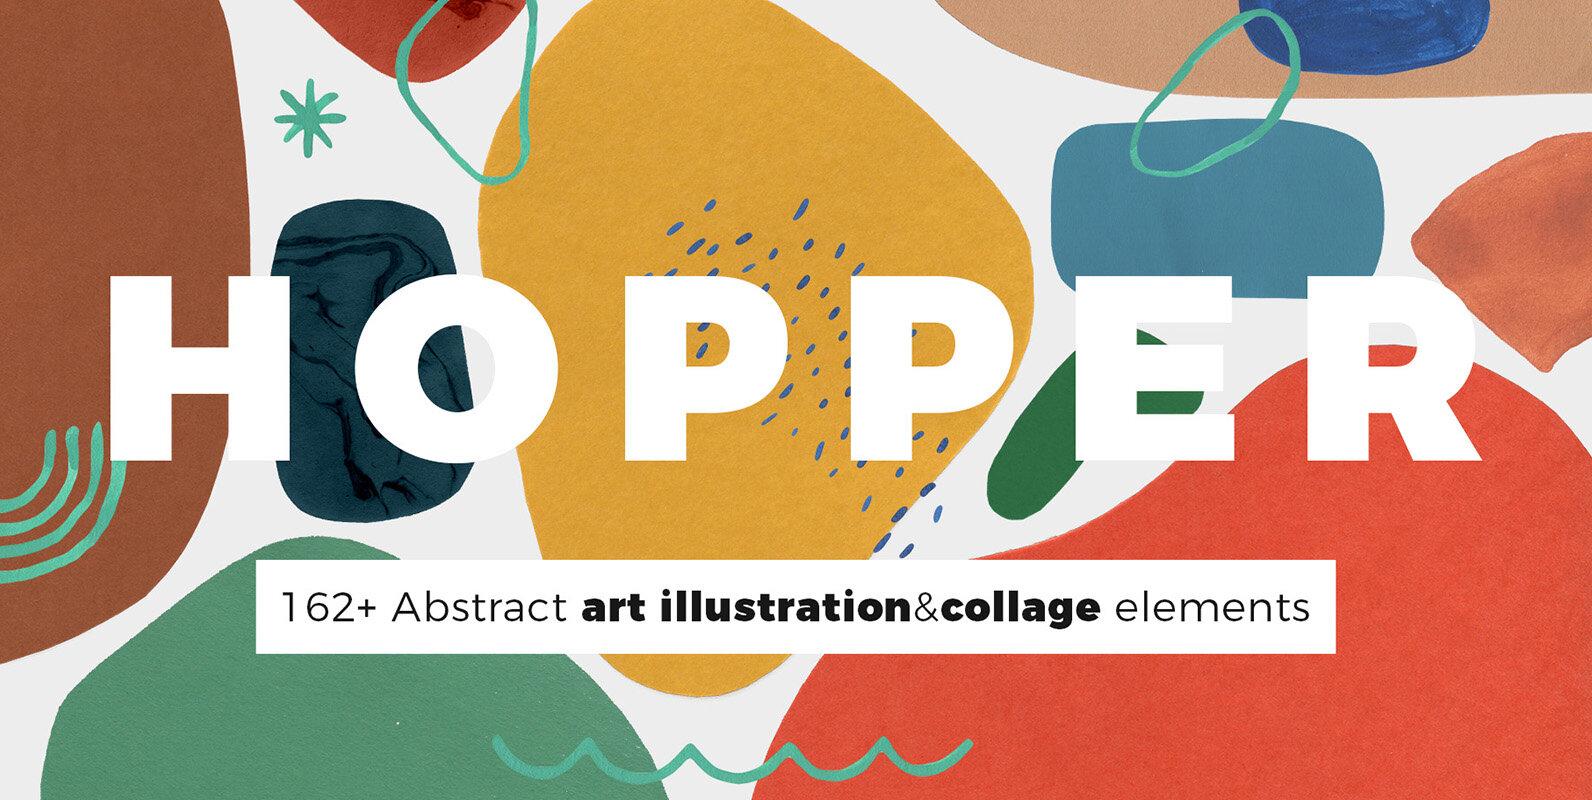 Edward Hopper Abstract Backgrounds